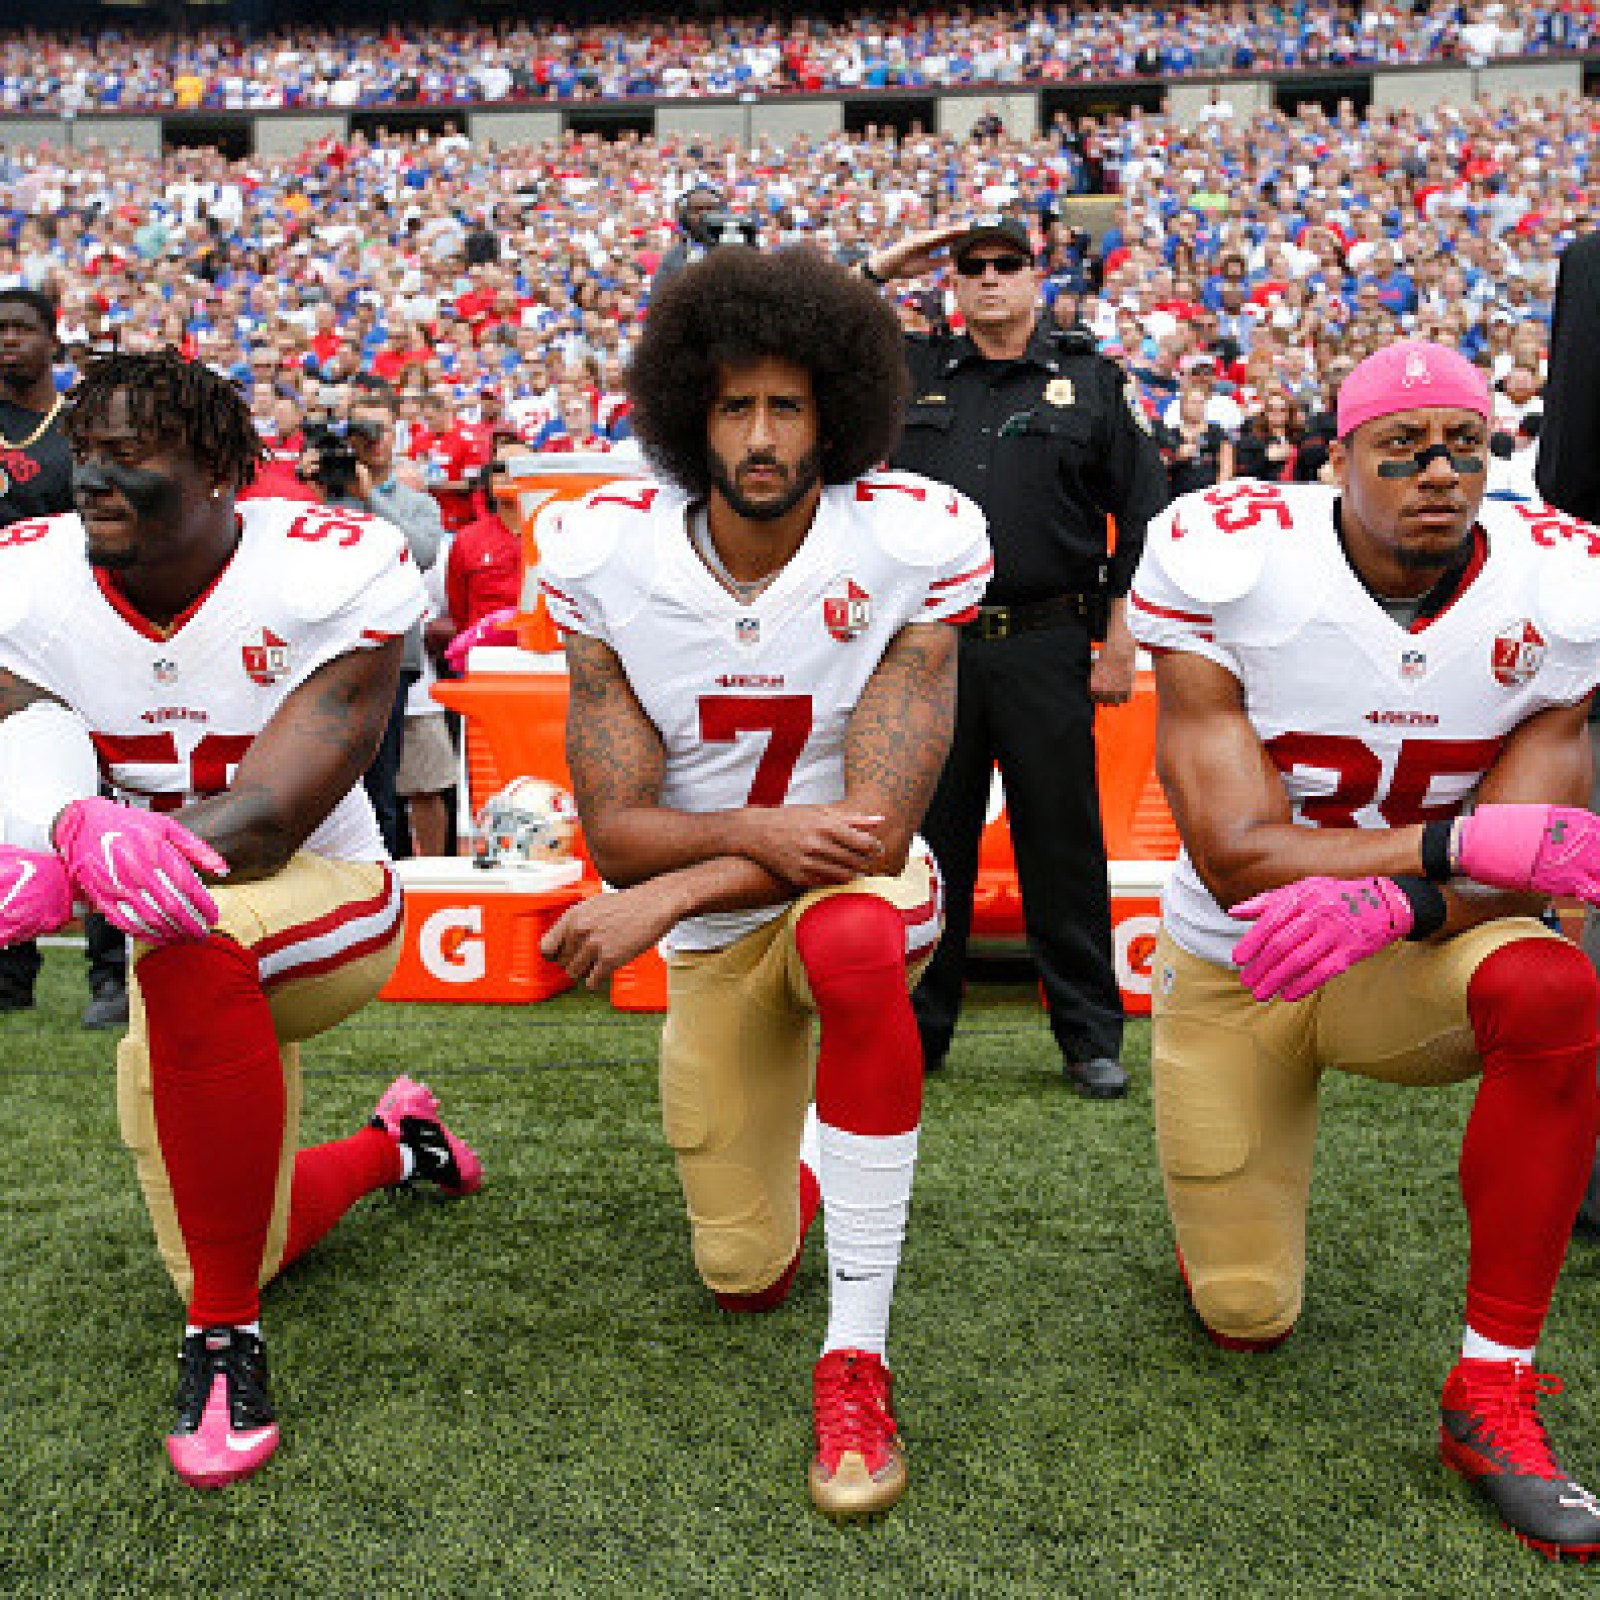 San Francisco 49ers v Buffalo Bills, Image from ESPN